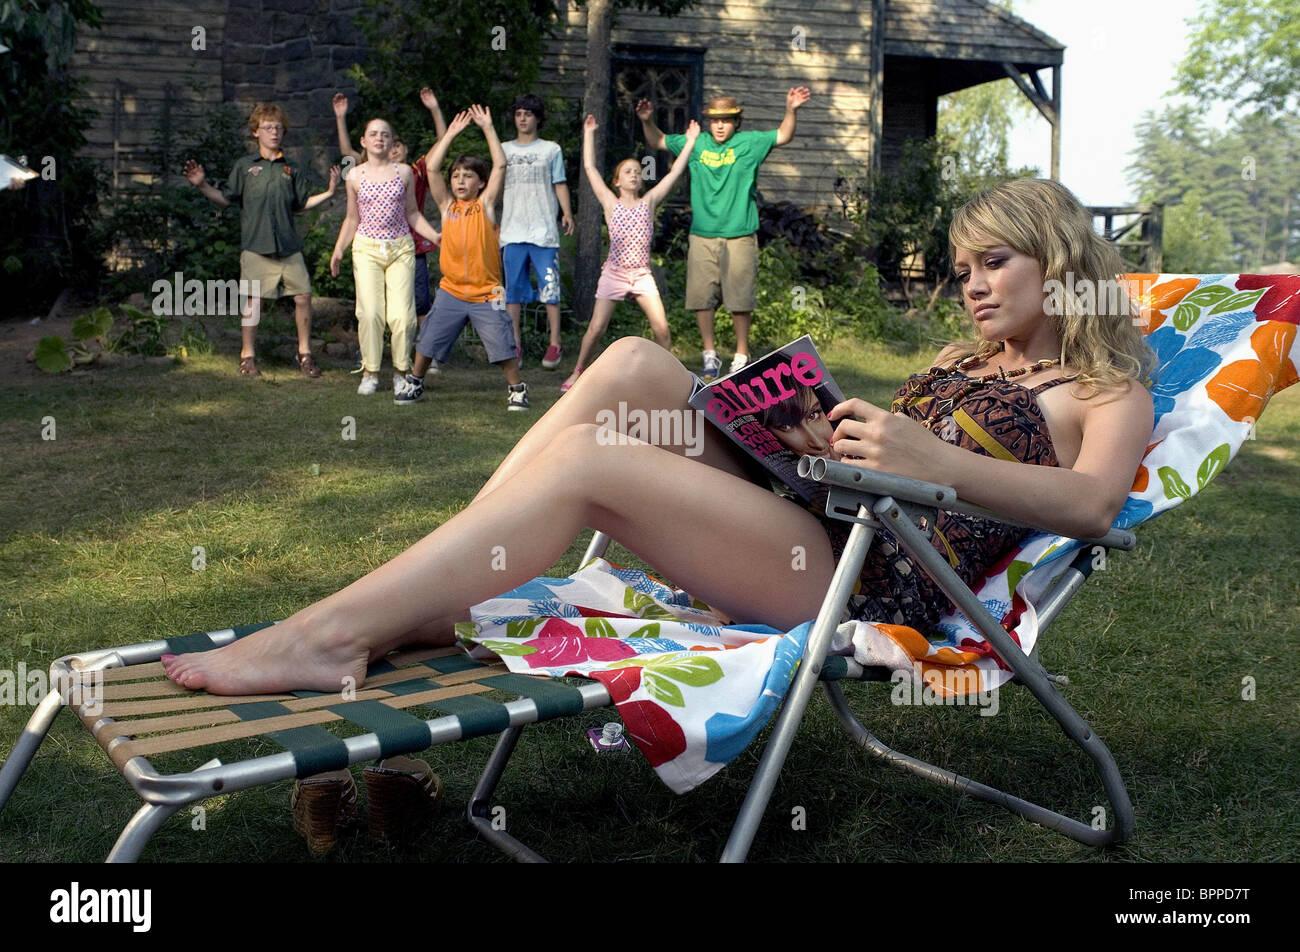 HILARY DUFF CHEAPER BY THE DOZEN 2 (2005) - Stock Image